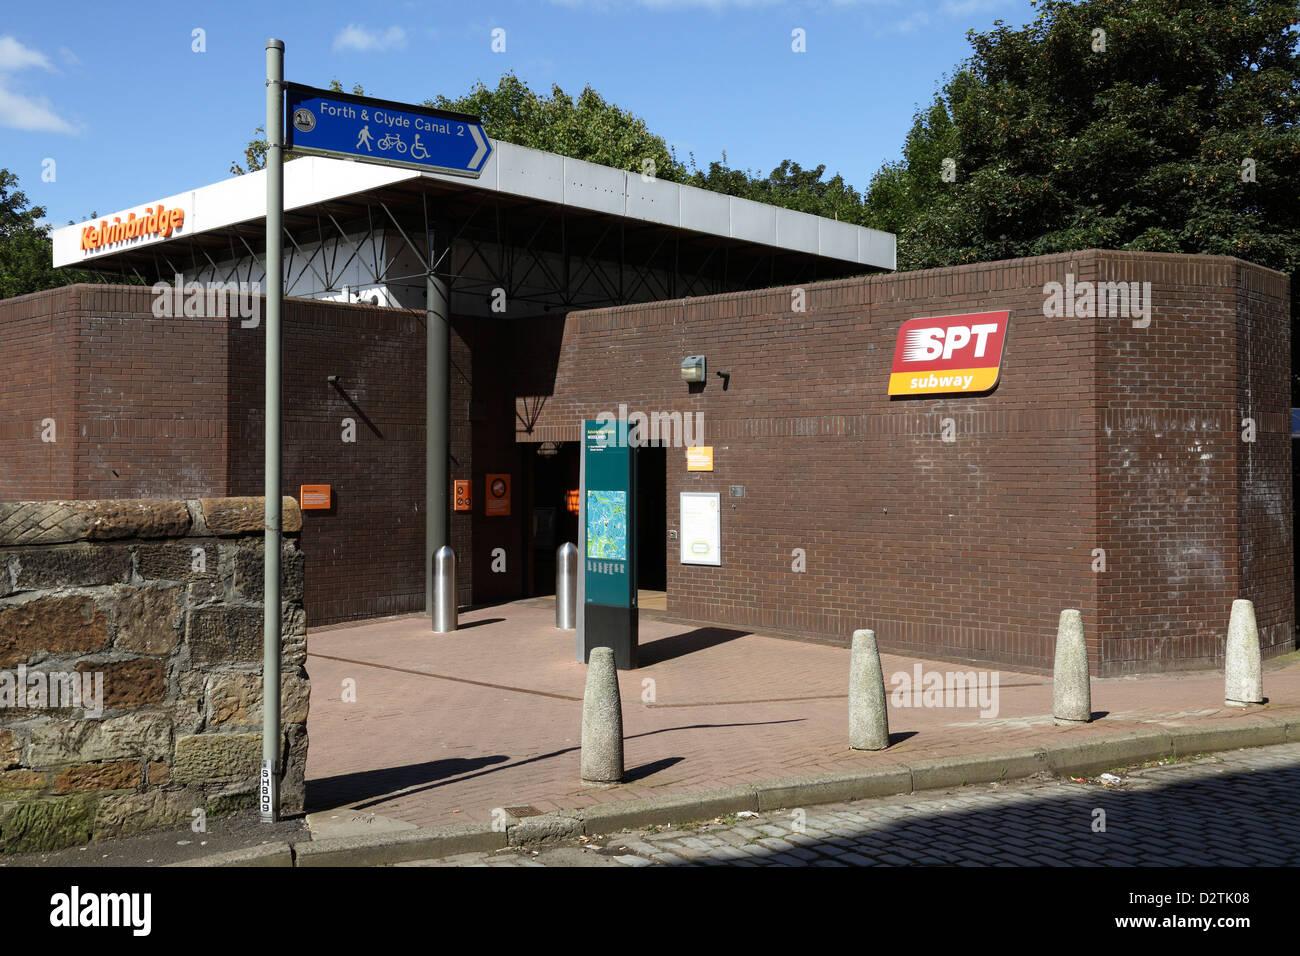 Entrance to Kelvinbridge Subway Station from South Woodside Road in the West End of Glasgow, Scotland, UK - Stock Image